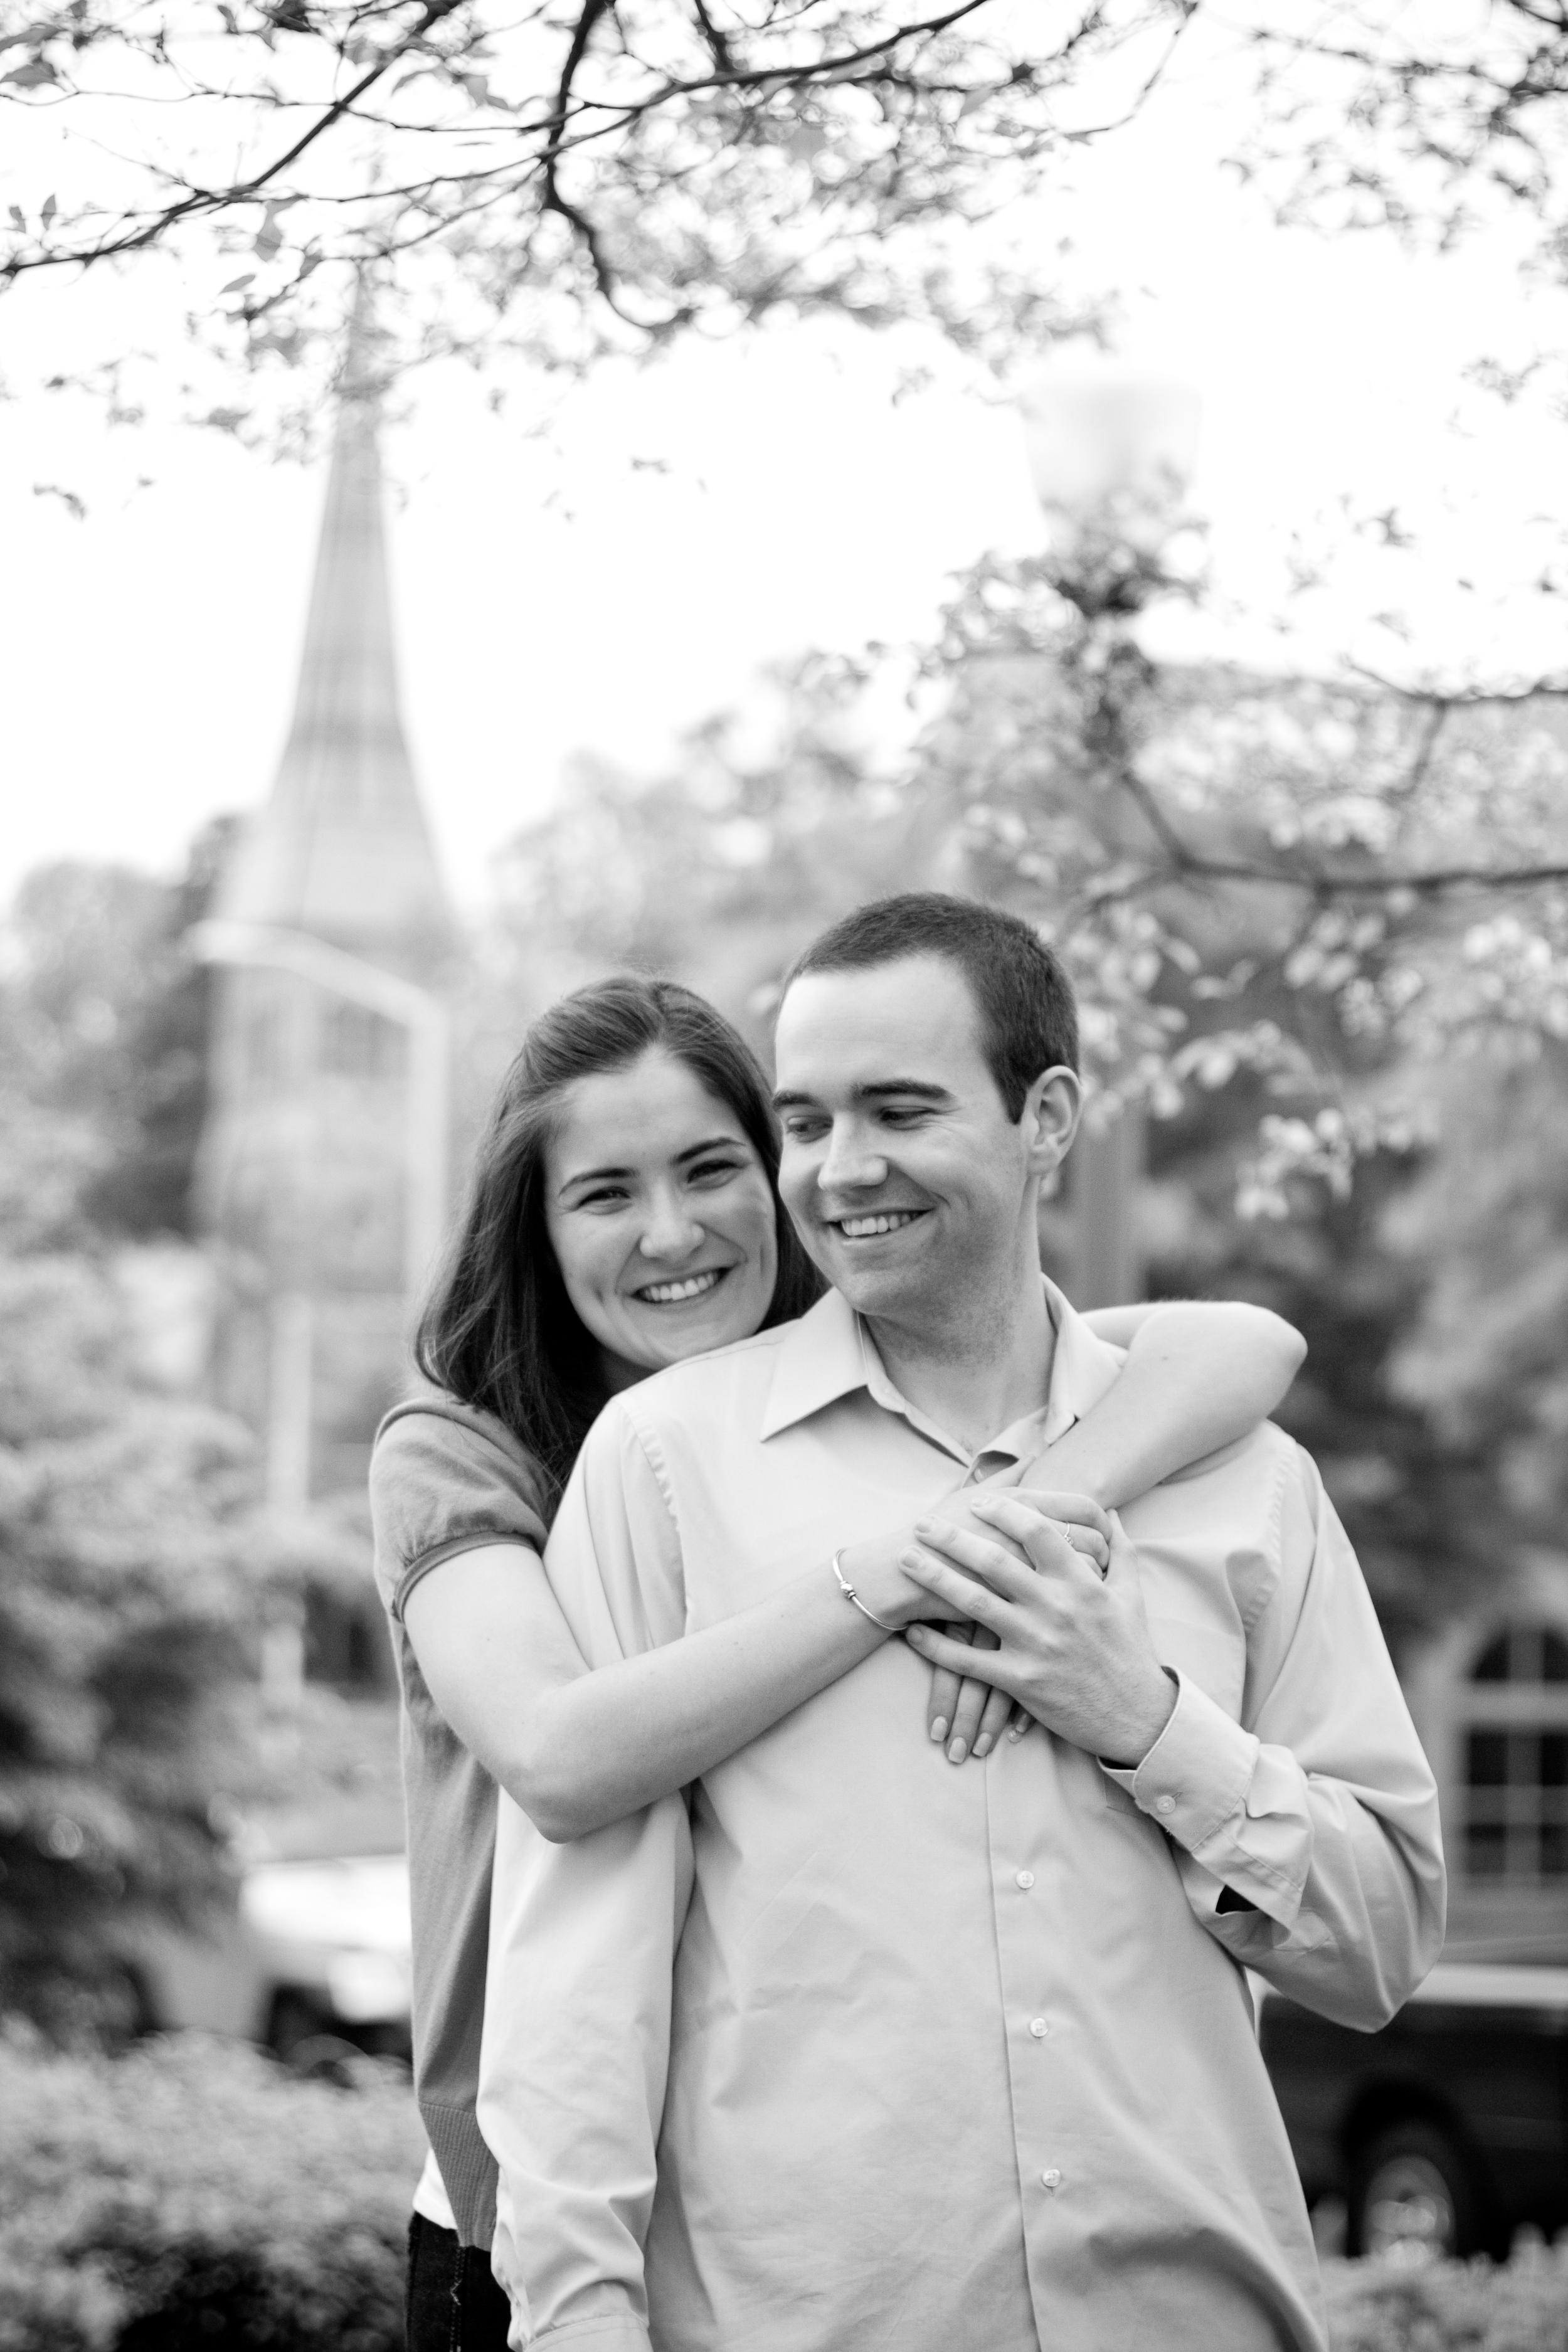 Amherst Massachusetts UMass Engagement Photography by Shannon Sorensen